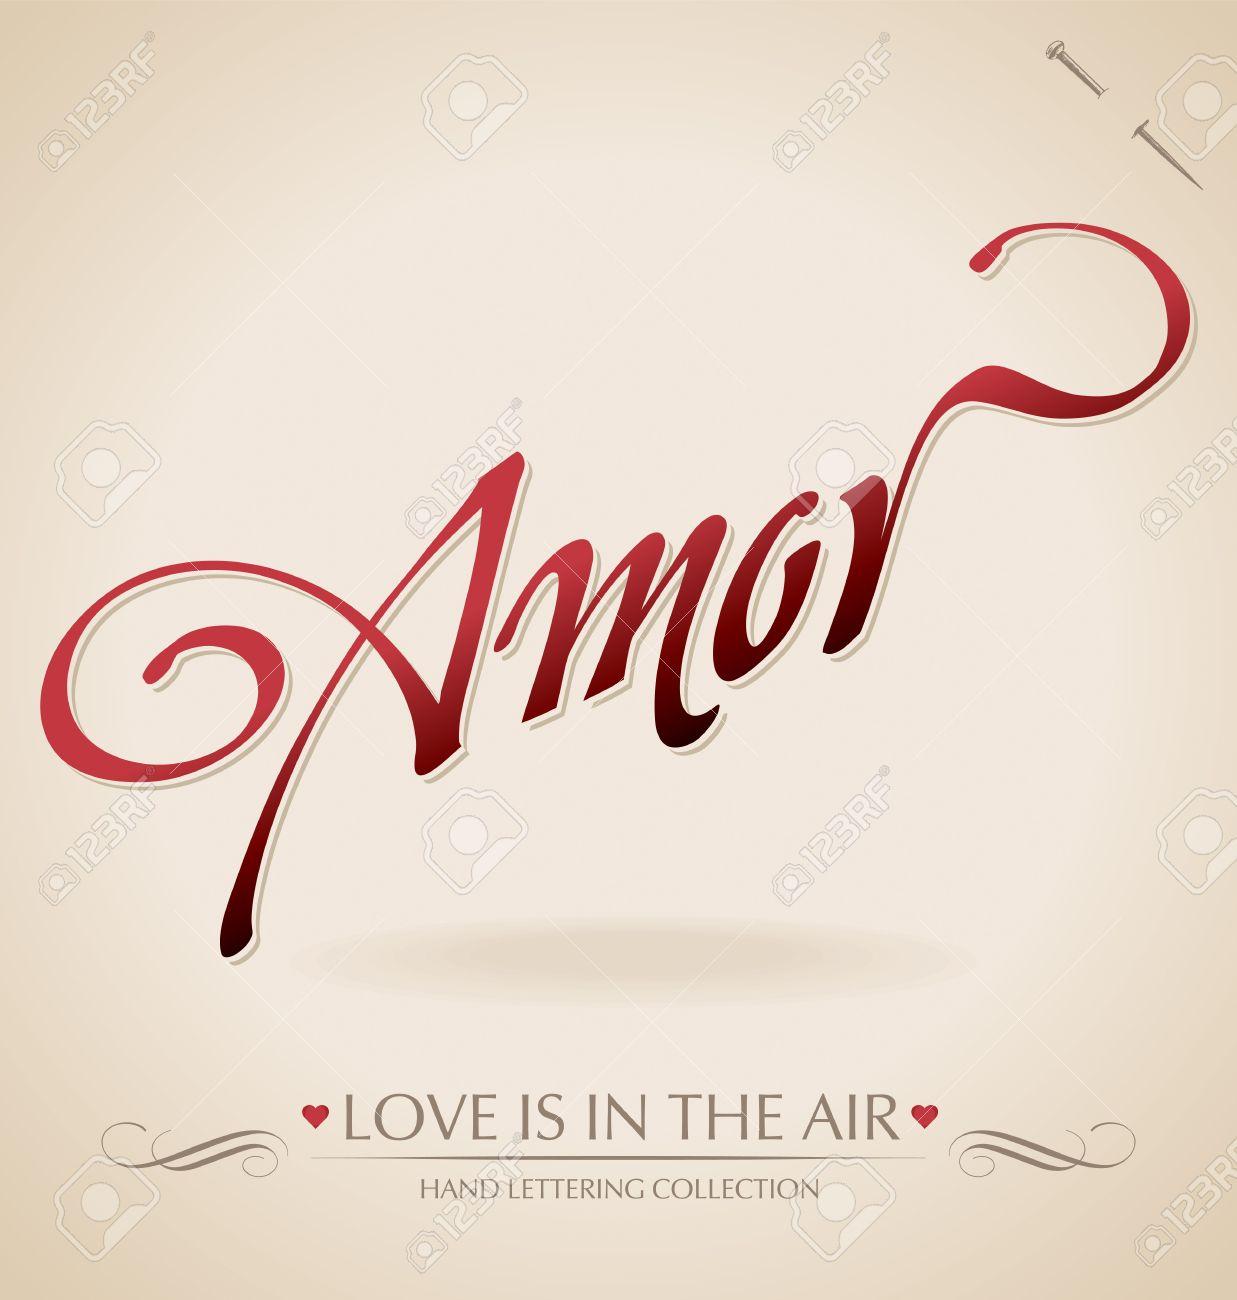 amor hand lettering (vector) Stock Vector - 11977308